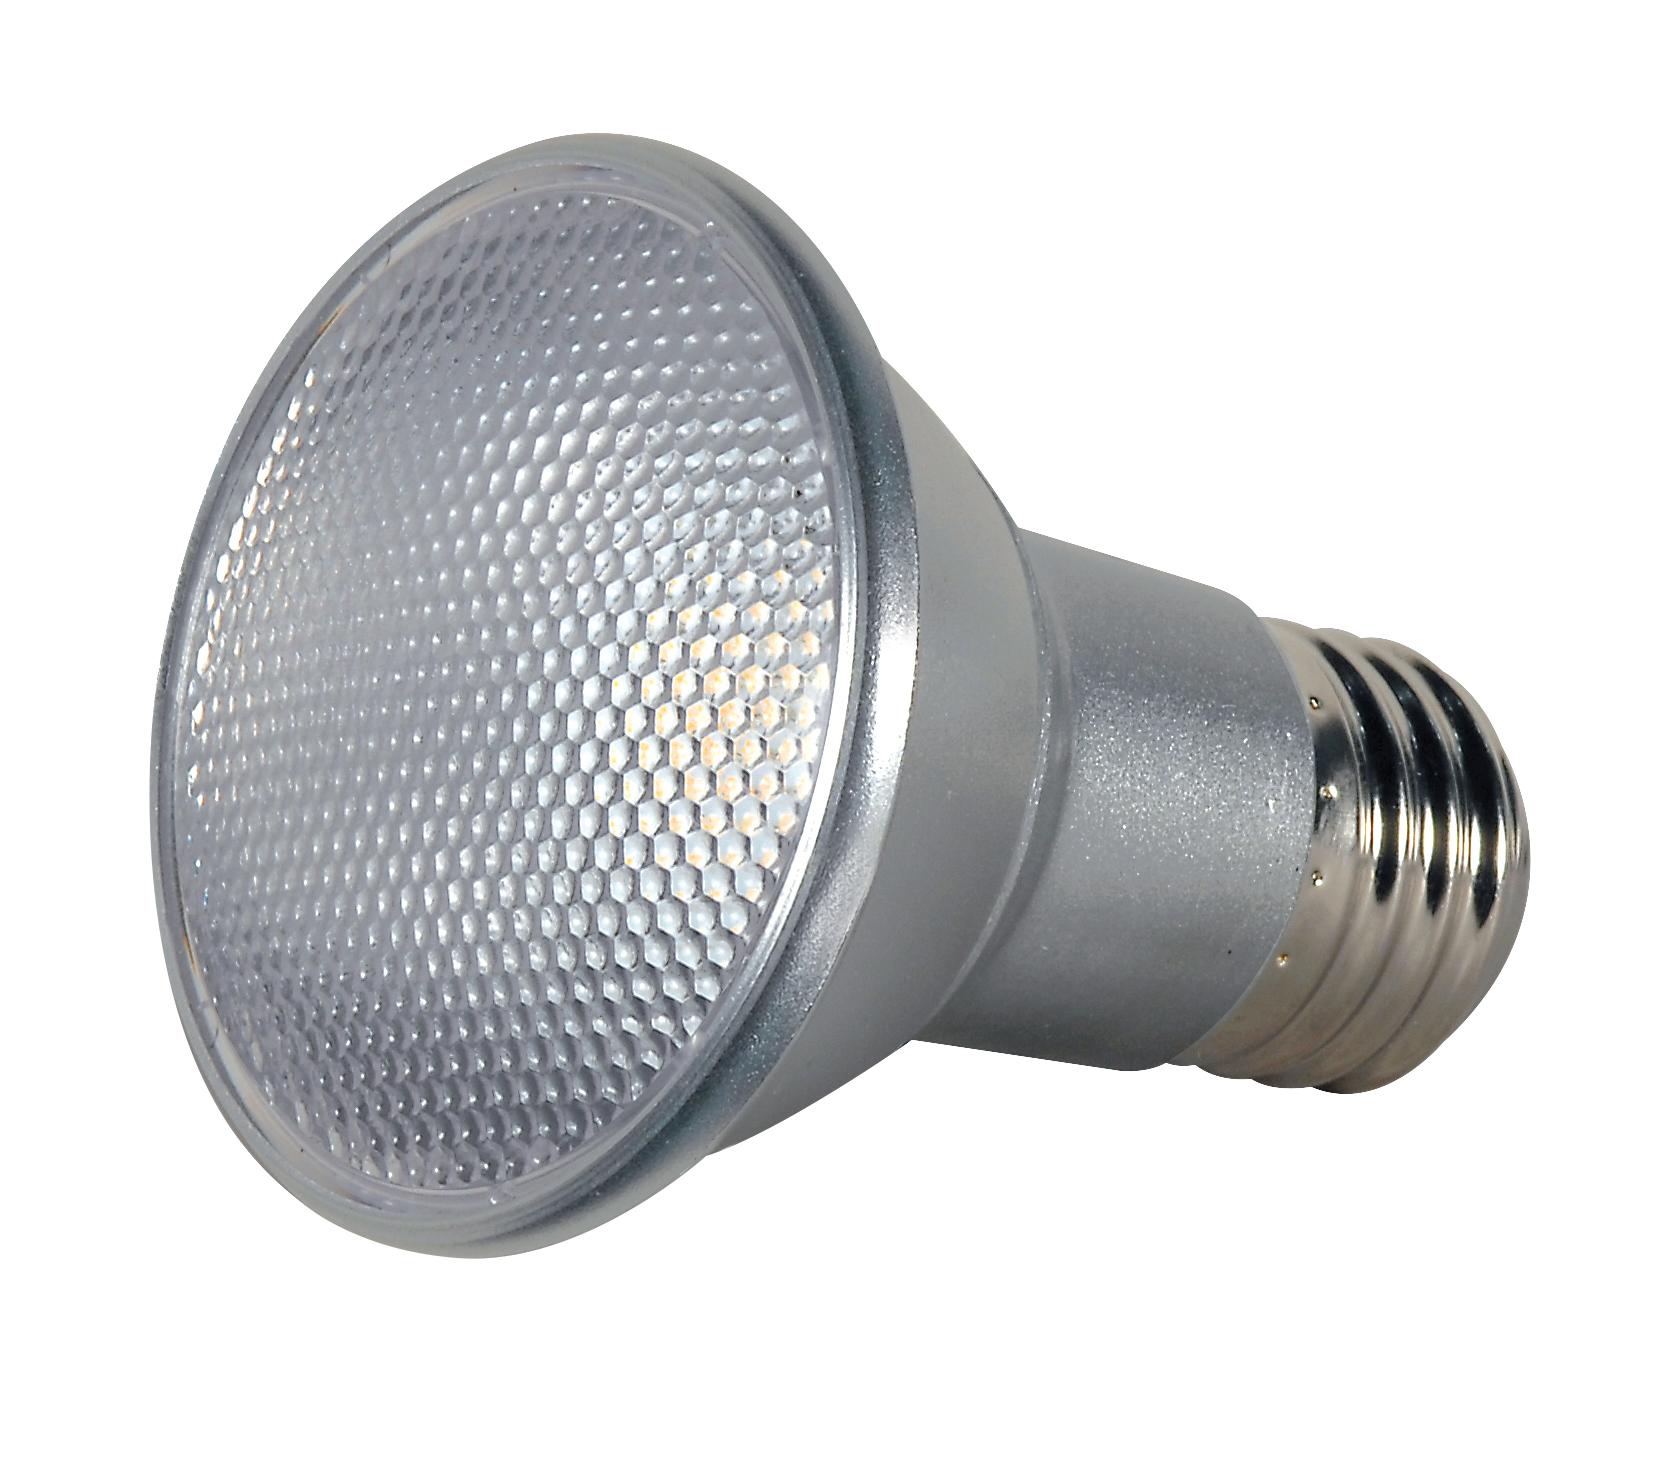 Satco,S9406,SATCO® S9406 Dimmable Reflective Lamp, 7 W, LED Lamp, Medium E26 Lamp Base, PAR20 Shape, 525 Lumens Initial